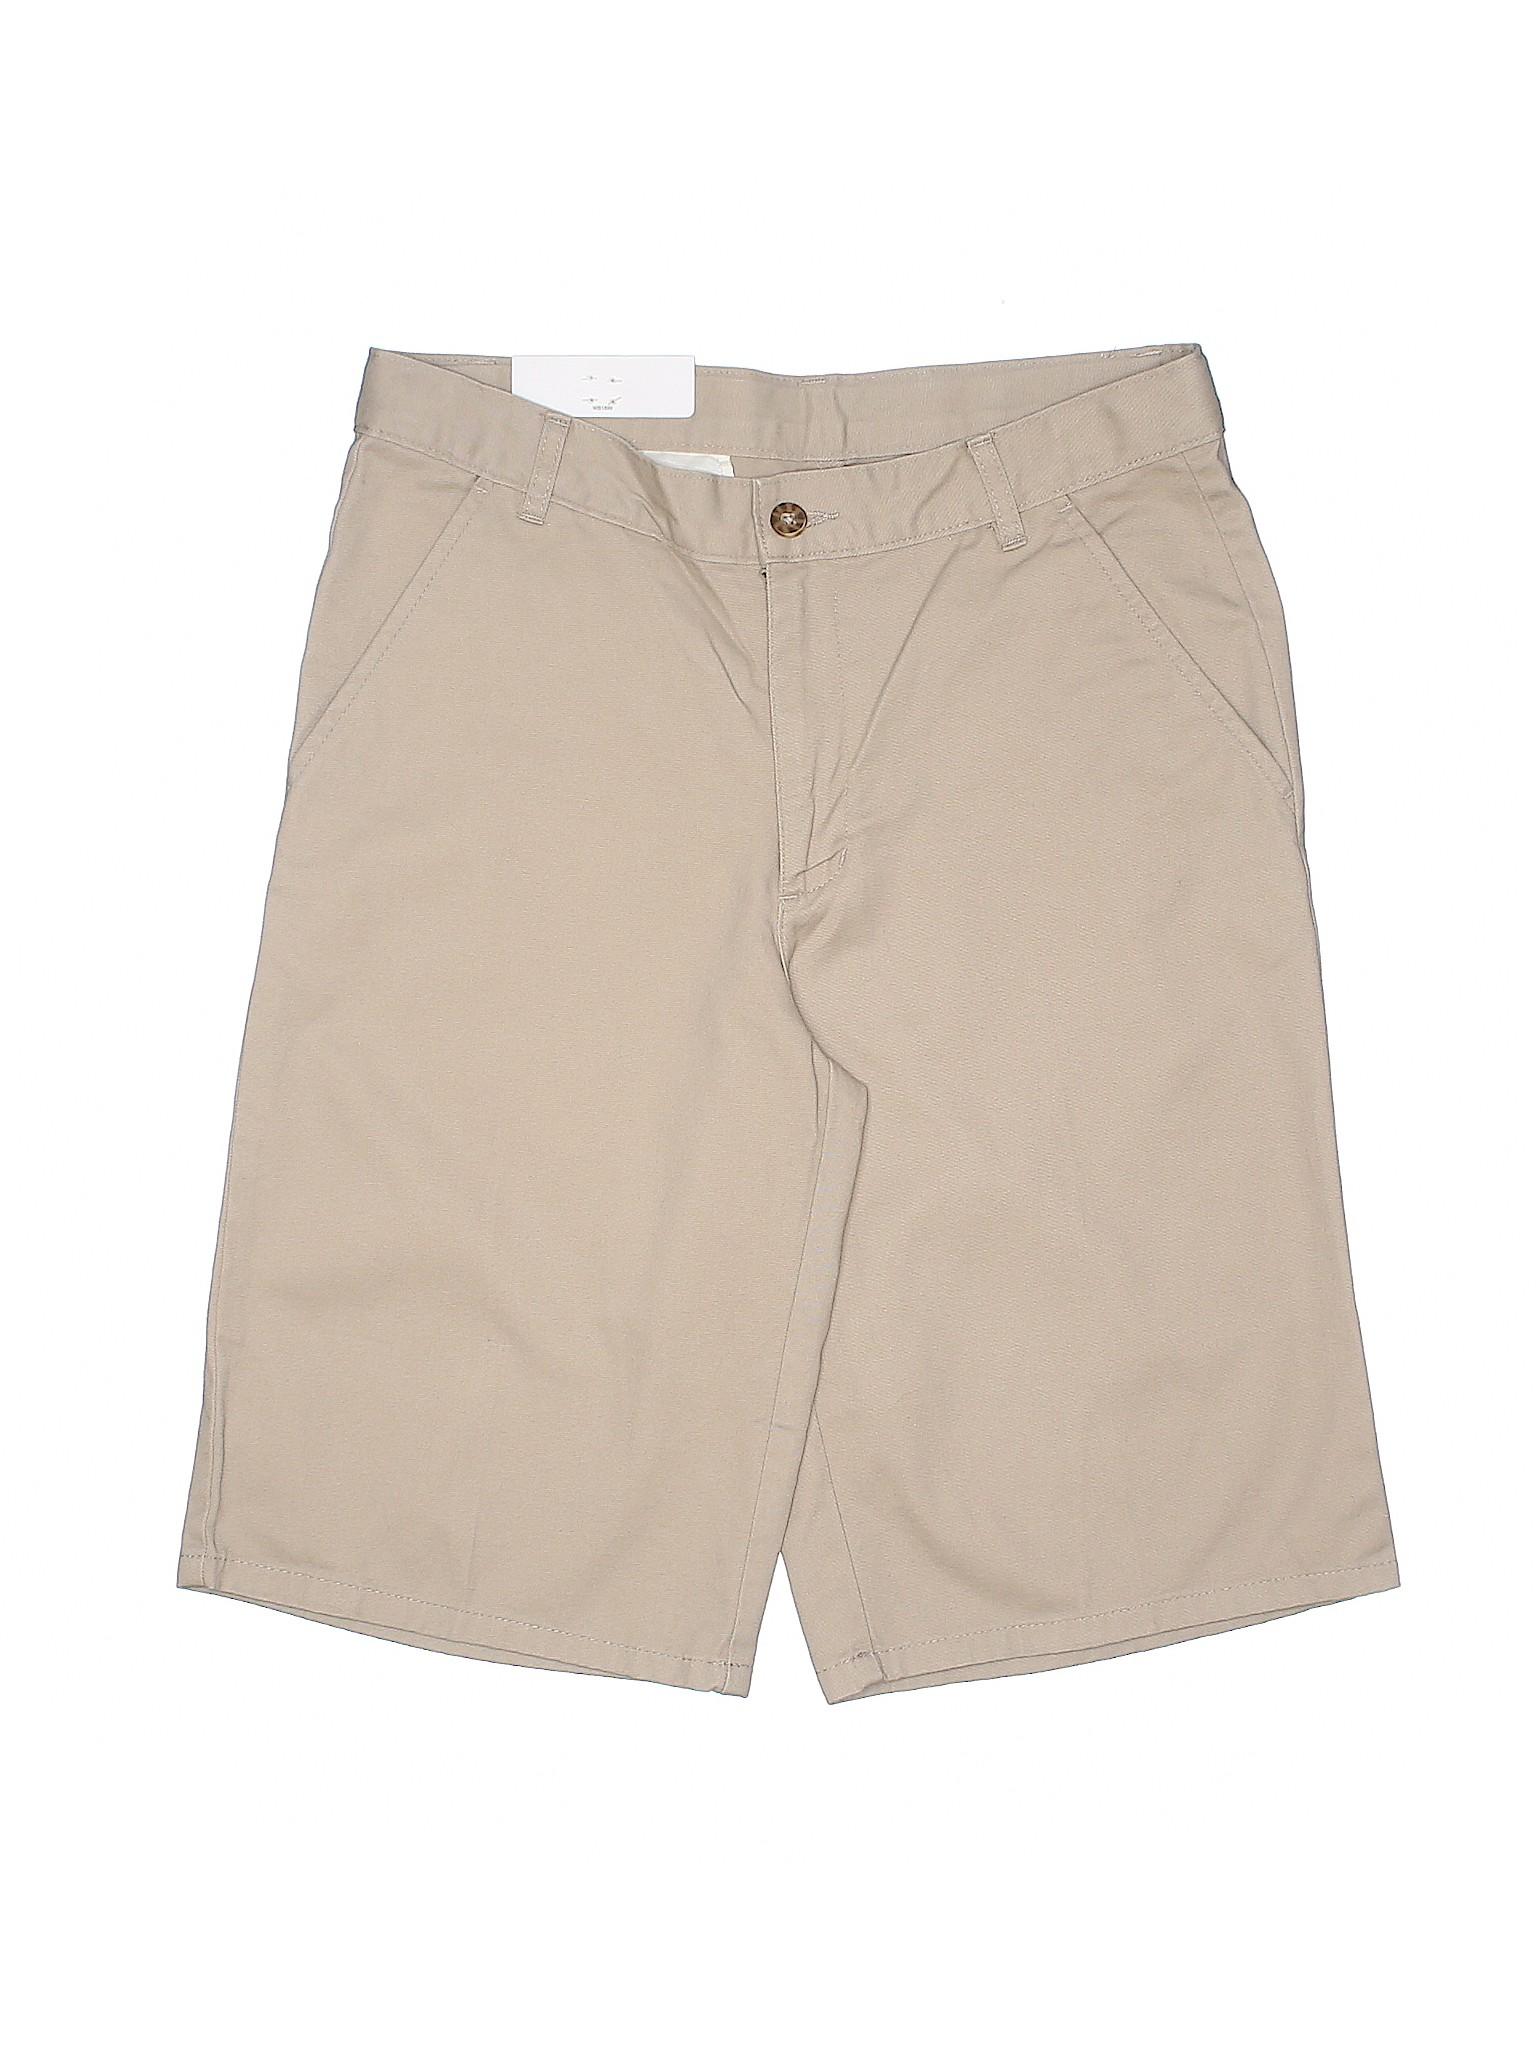 Khaki Khaki IZOD Khaki Khaki Shorts IZOD Shorts Boutique Boutique Boutique IZOD IZOD Shorts Shorts Boutique IZOD Boutique Khaki qC1Bzq